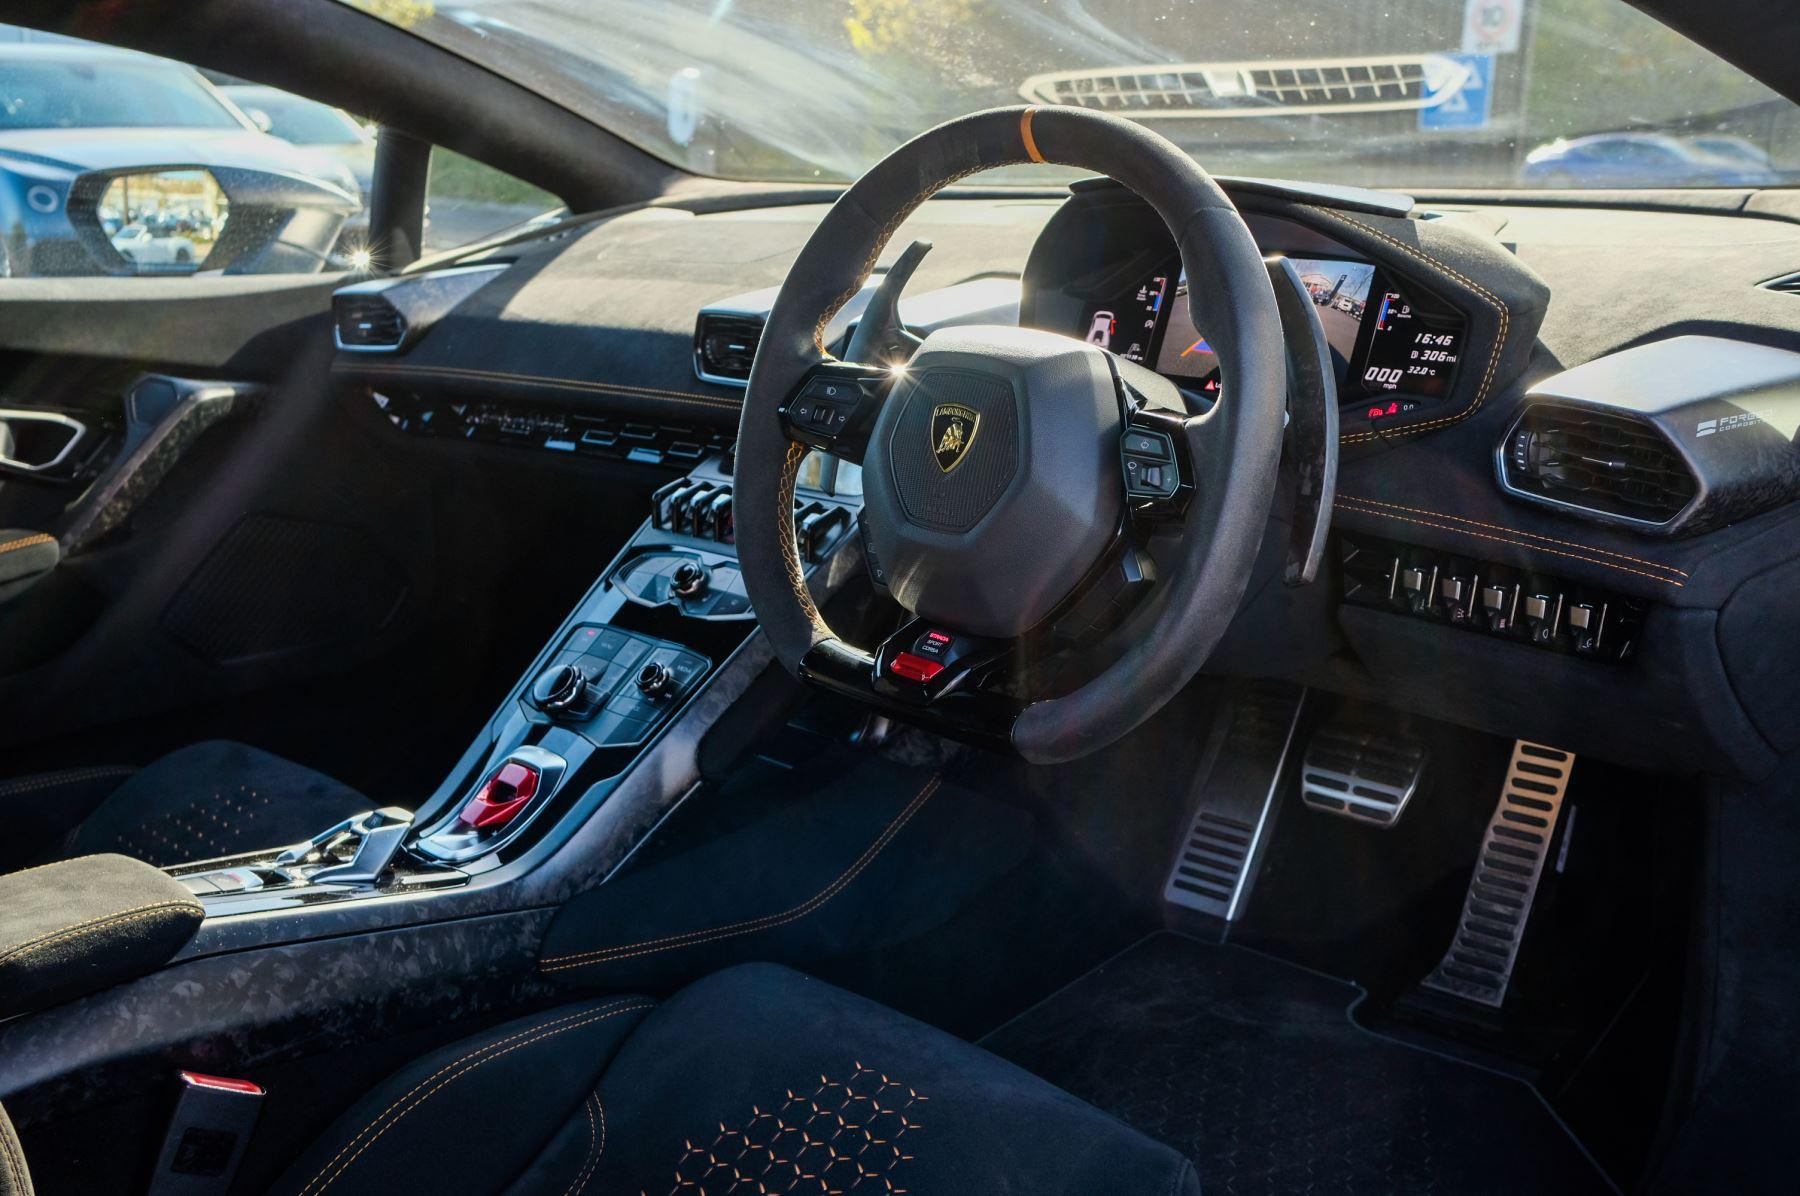 Lamborghini Huracan Performante LP 640-4 2dr LDF - Carbon Ceramic Brakes - Carbon Fiber Features - Comfort Seats image 12